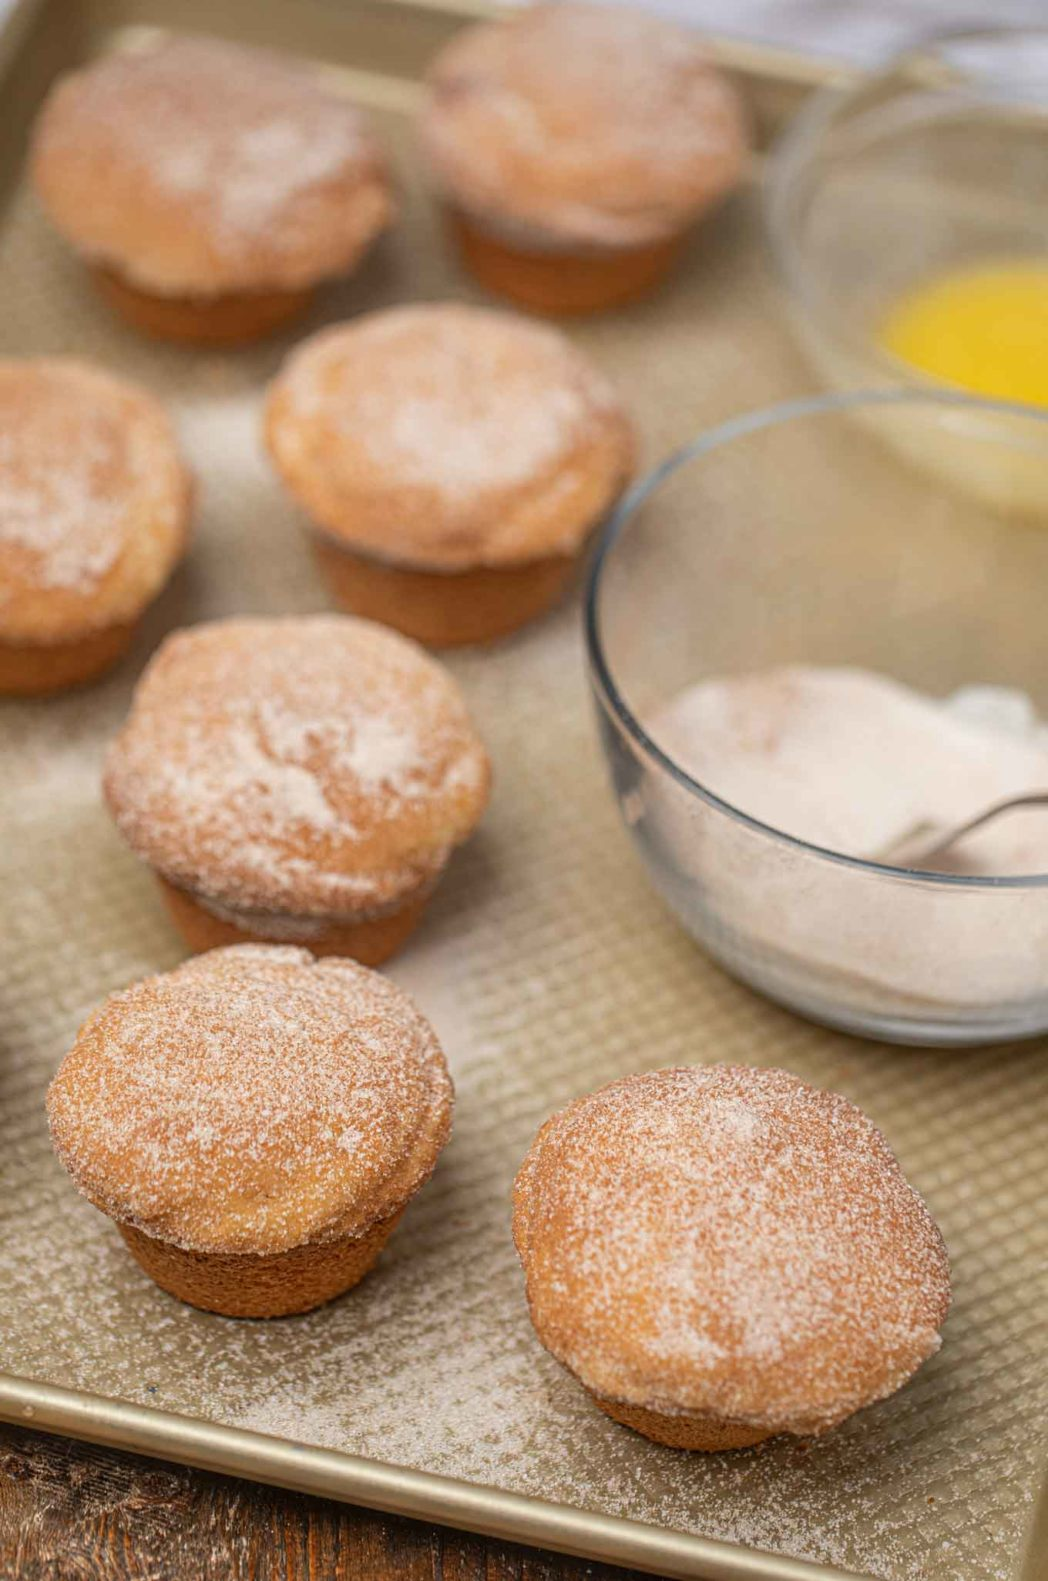 Cinnamon Sugar Donut Muffins with cinnamon sugar topping